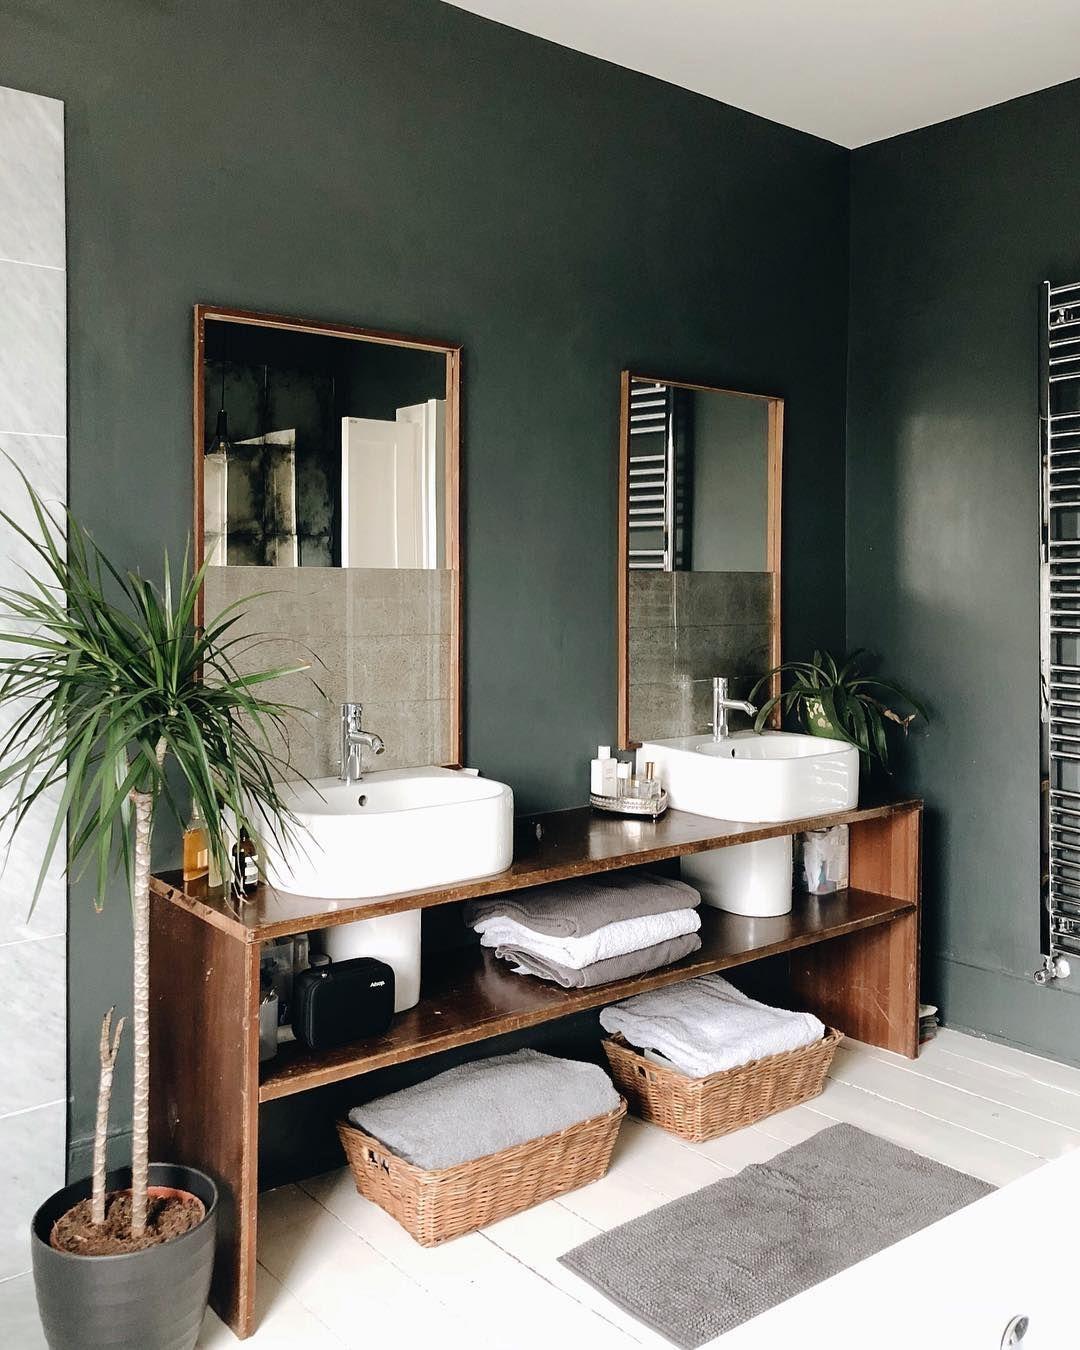 Photo of 15 Inspiring Interior Design Instagram Accounts to Follow